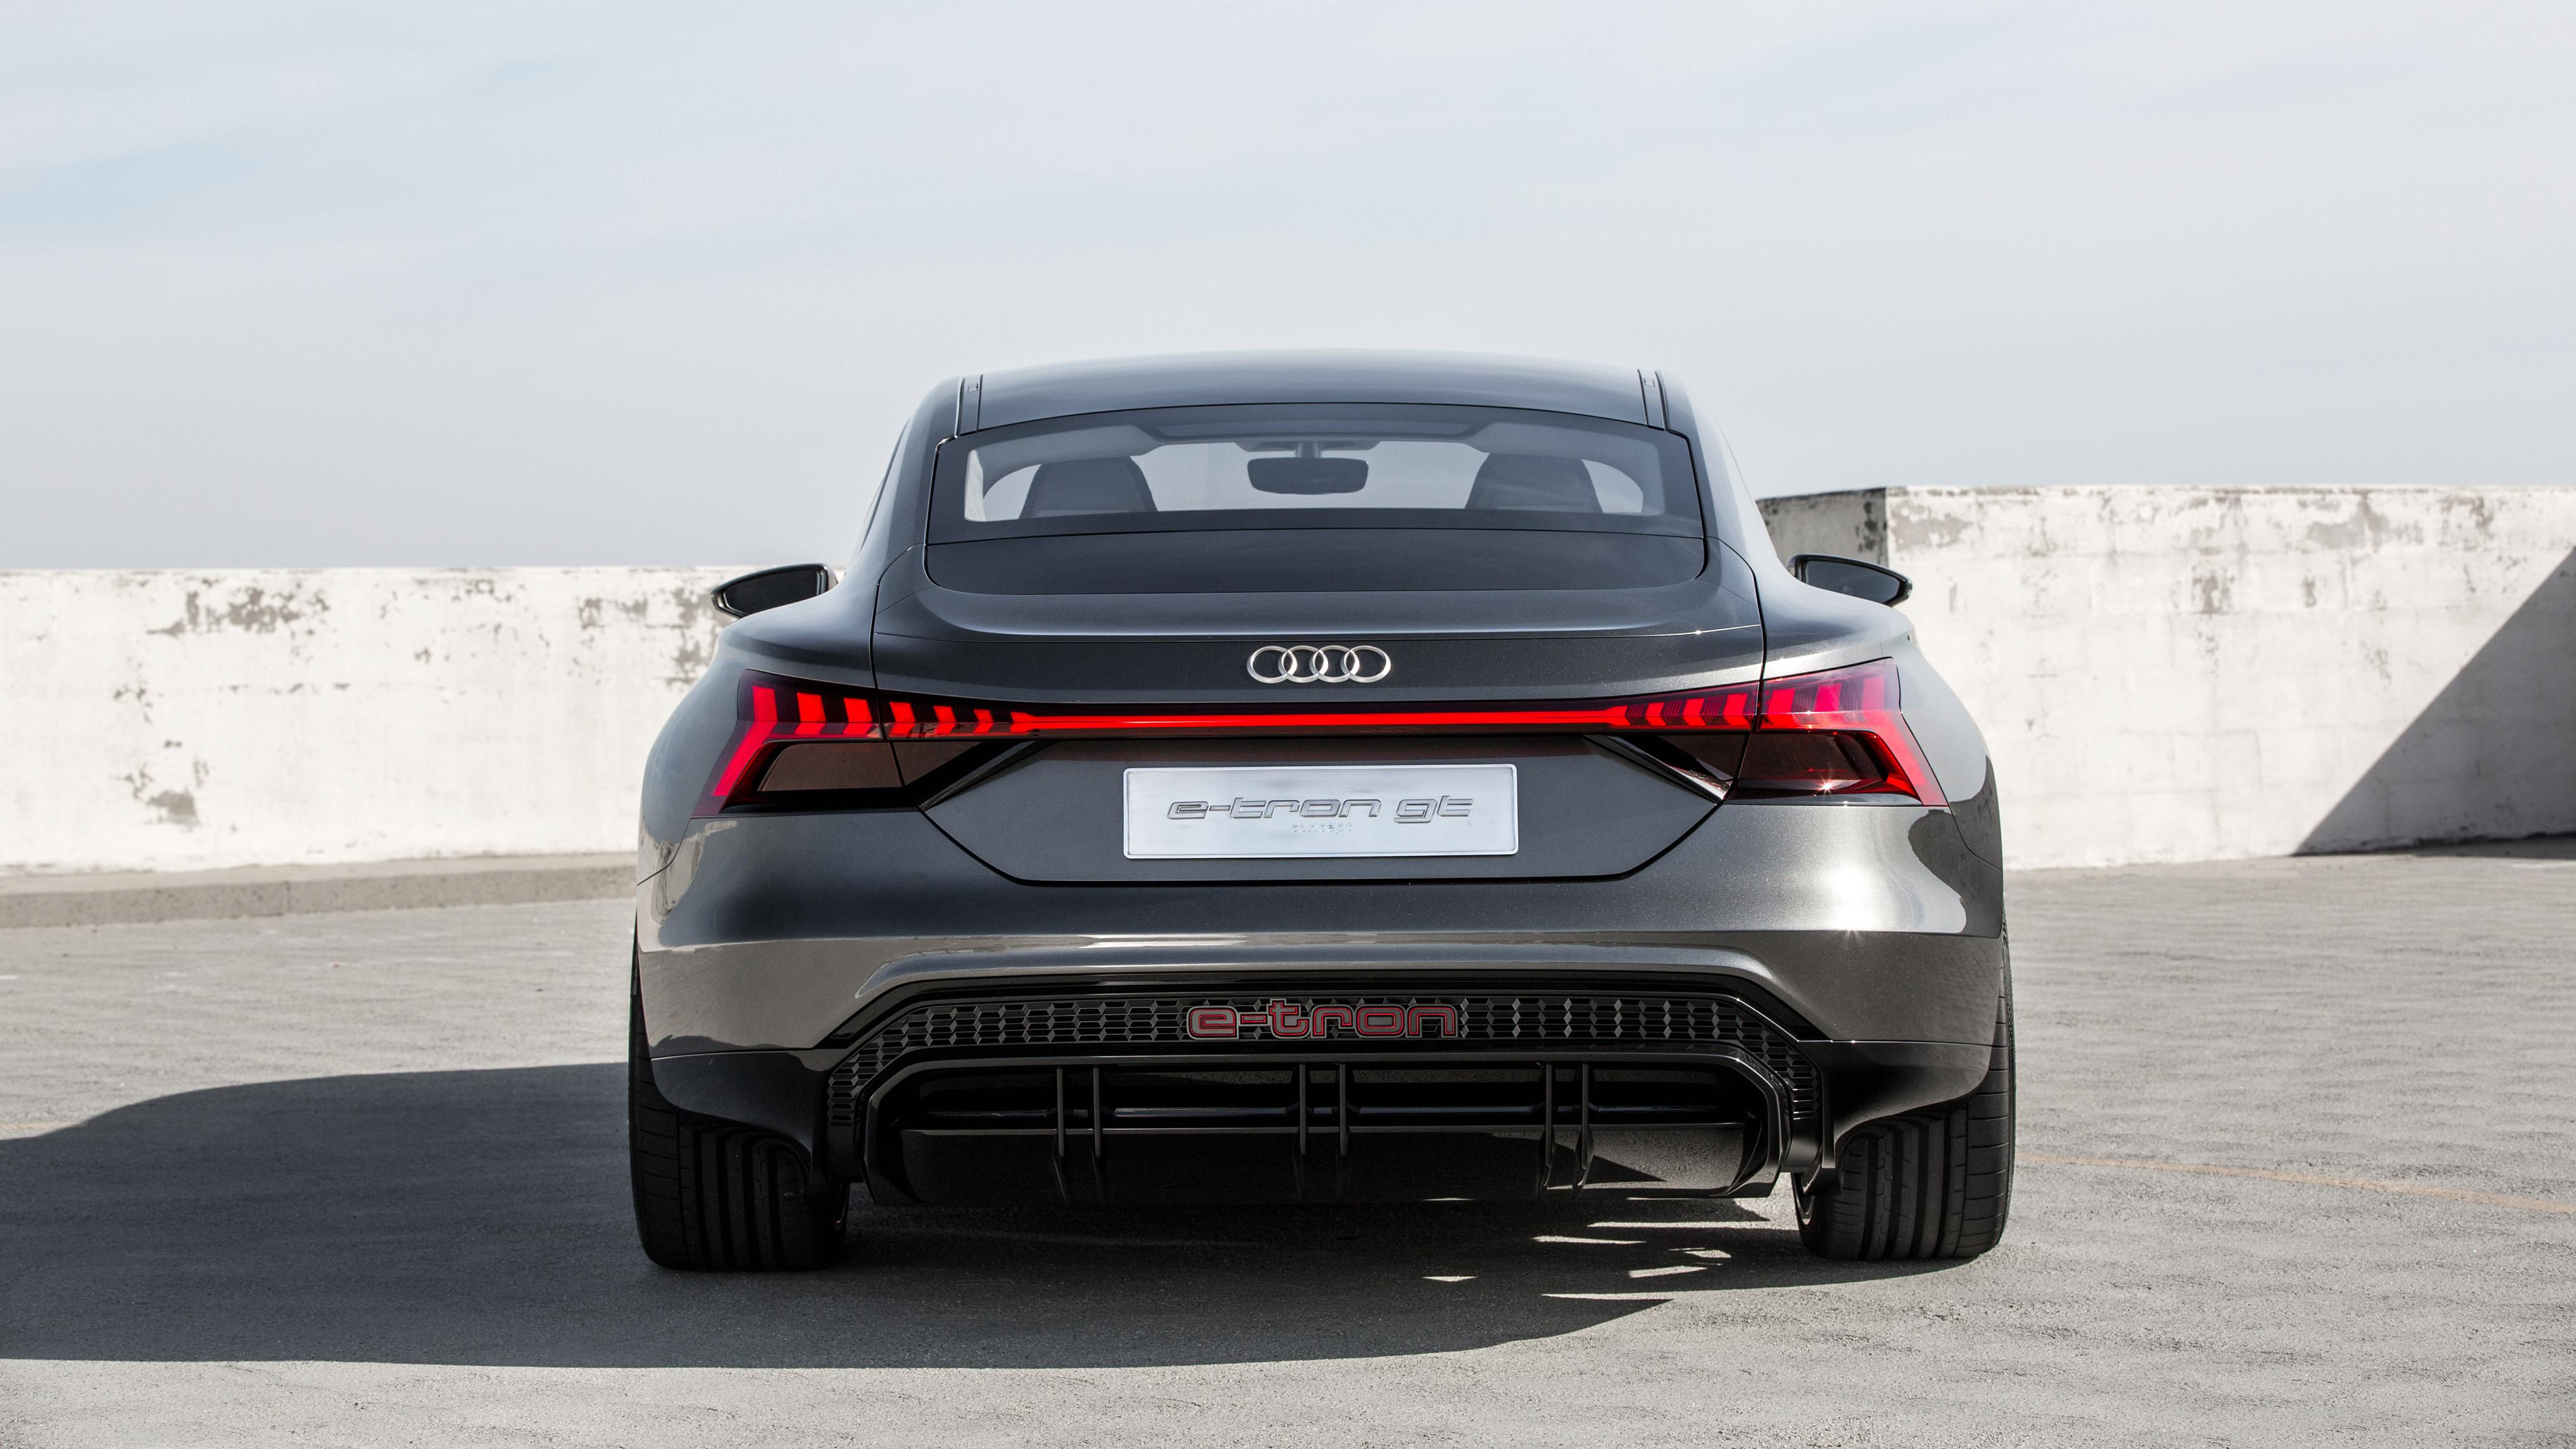 Wallpaper 4k Audi E Tron Gt Concept 4k 2019 Audi 2019 Etron Hd 4k Wallpapers Audi Etron 4k Wallpapers Audi Etron Gt Hd 4k 2019 Wallpapers